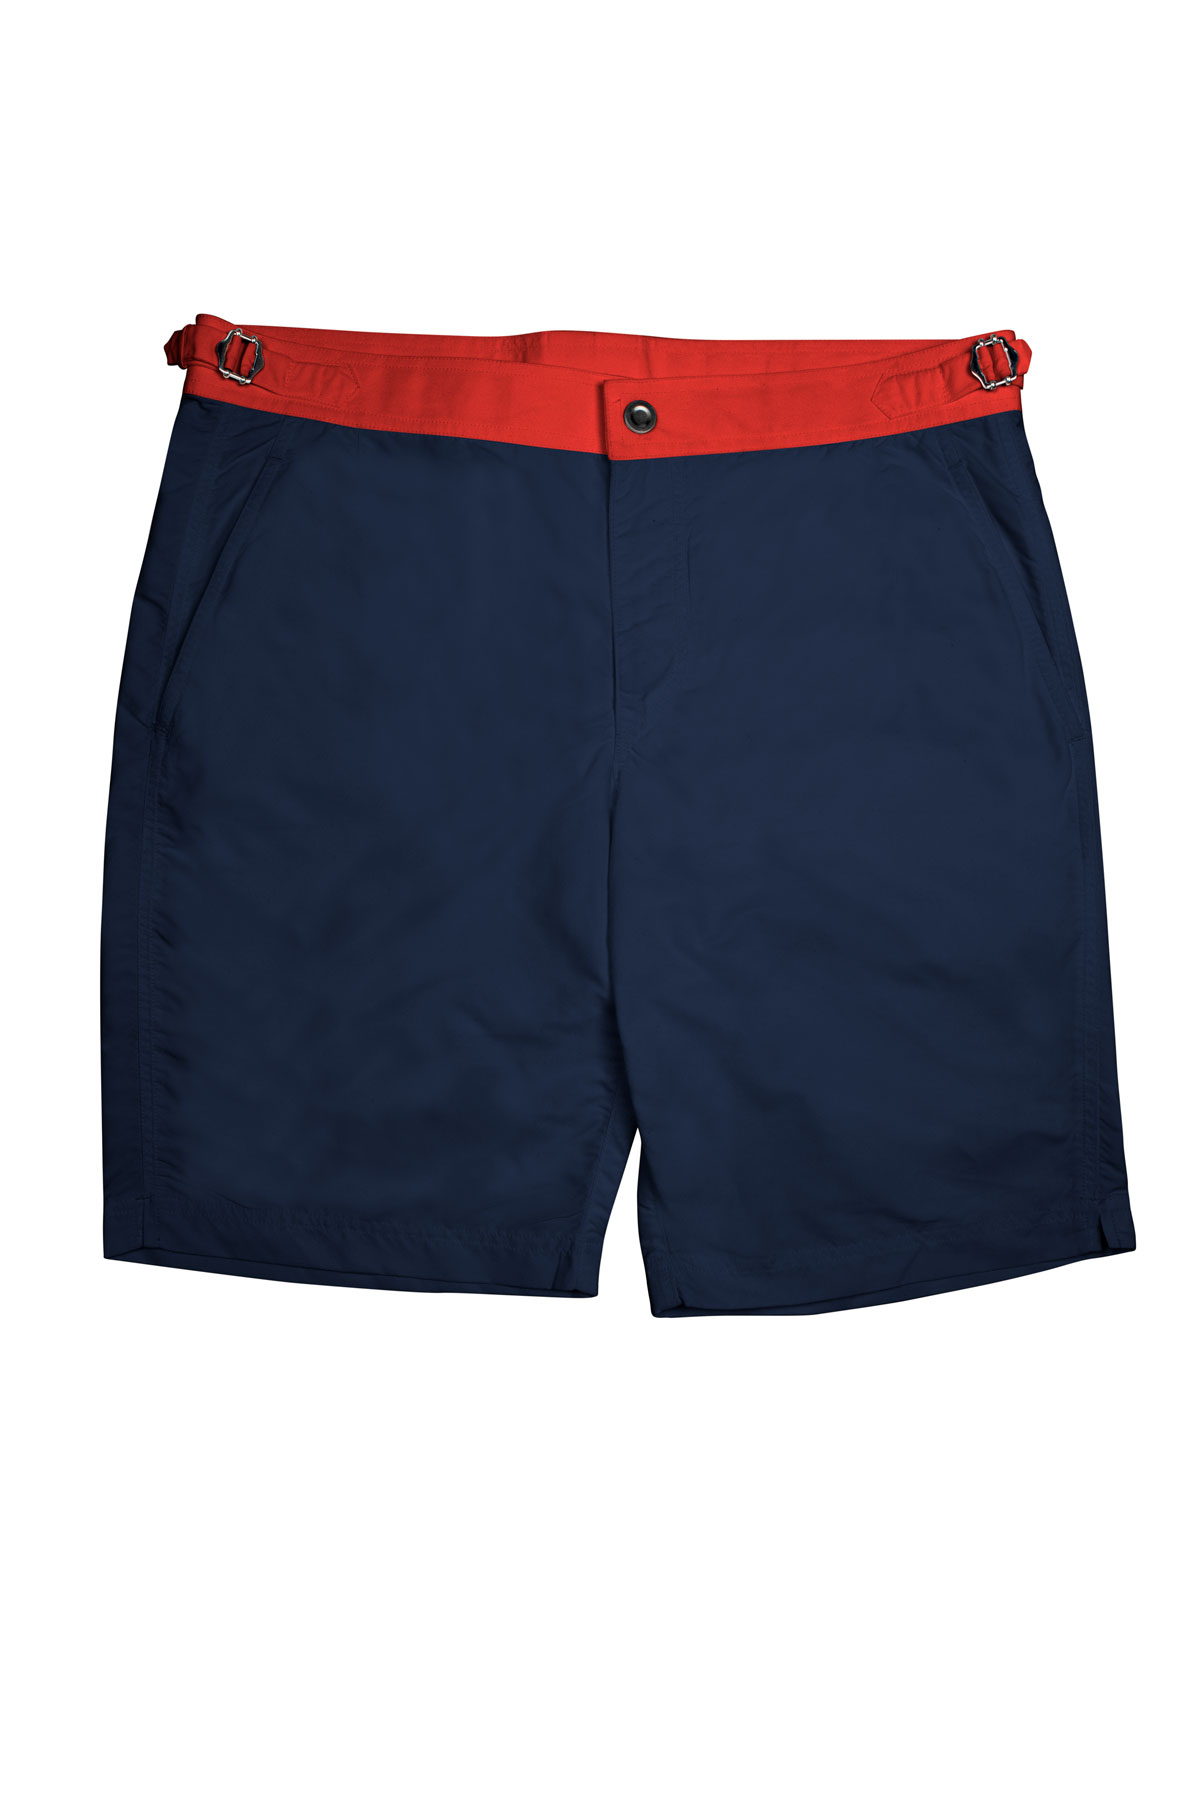 Navy Blue Swim Shorts w Red Waistband